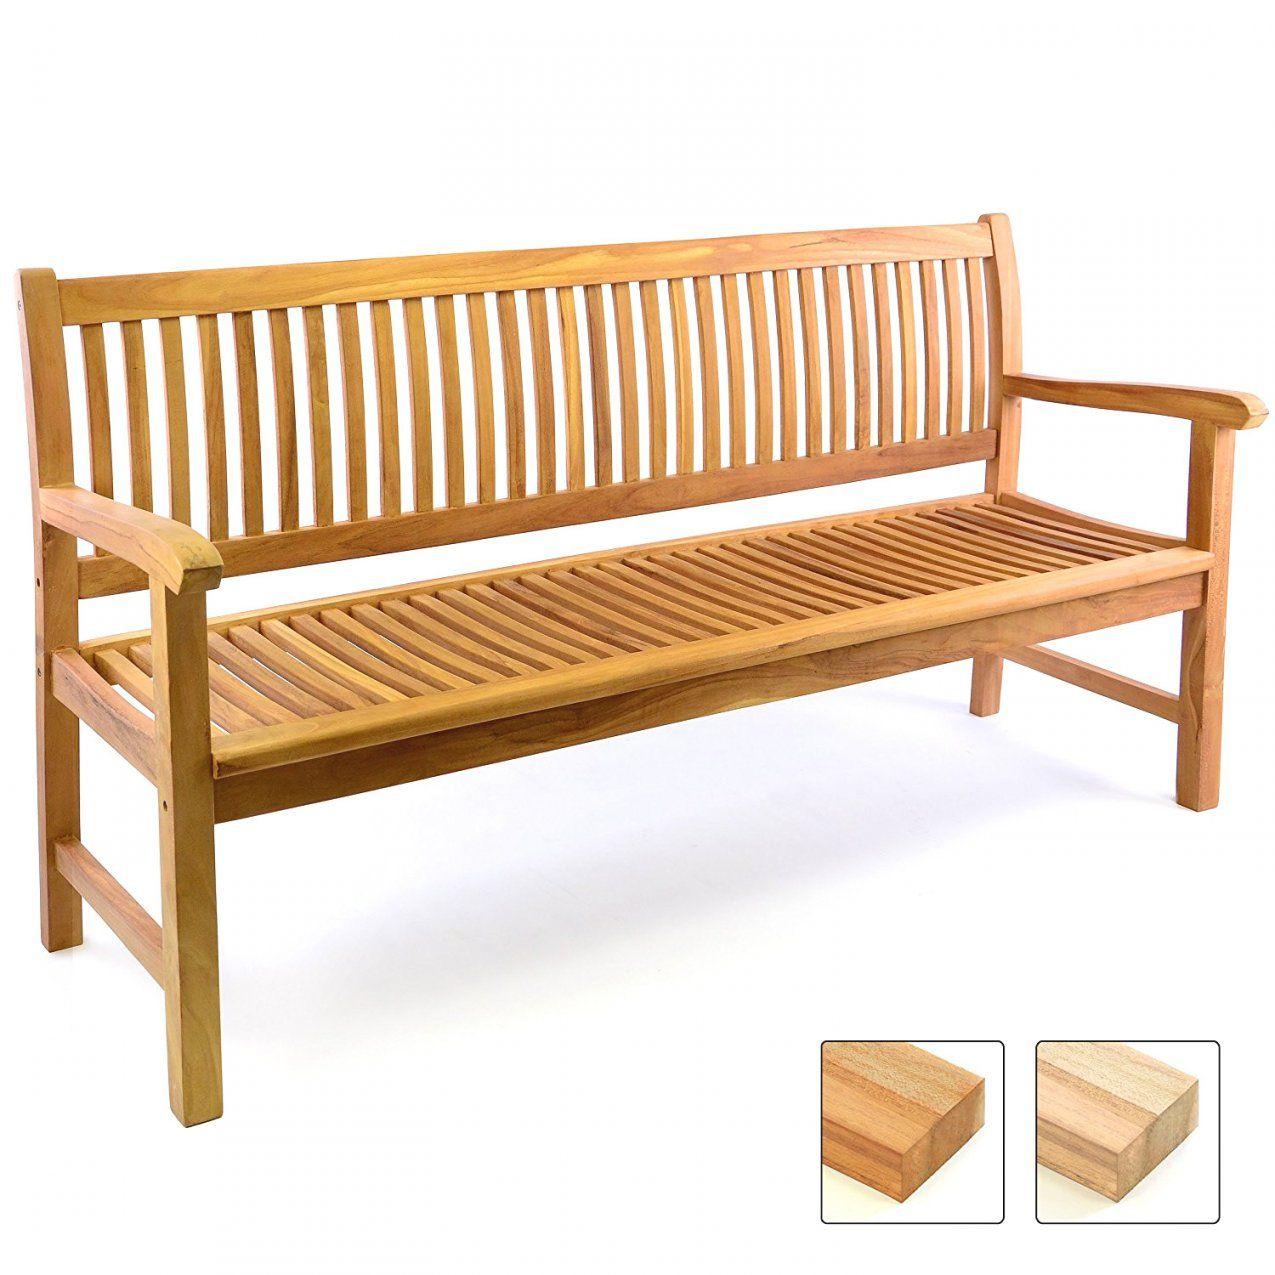 Inspiration Gartenbank Holz Ohne Armlehne 180 Cm Konzept Garten Von Gartenbank  Holz Ohne Armlehne Photo